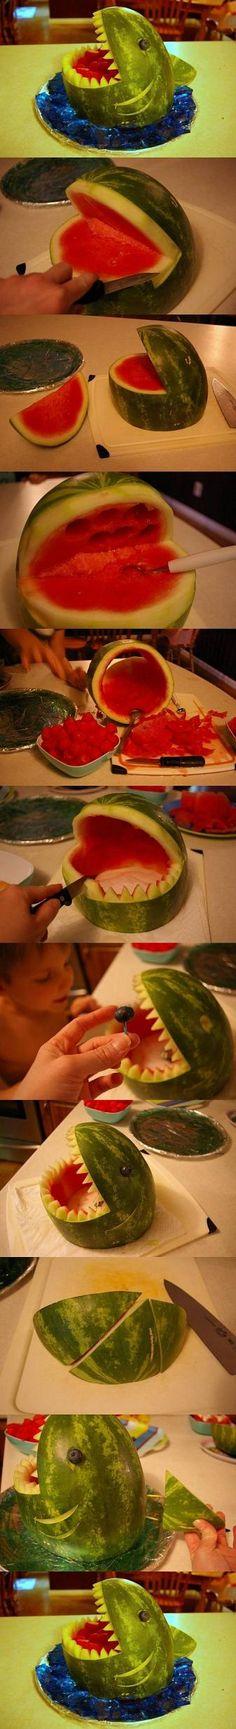 DIY Watermelon Shark Carving Internet Tutorial DIY Projects   UsefulDIY.com